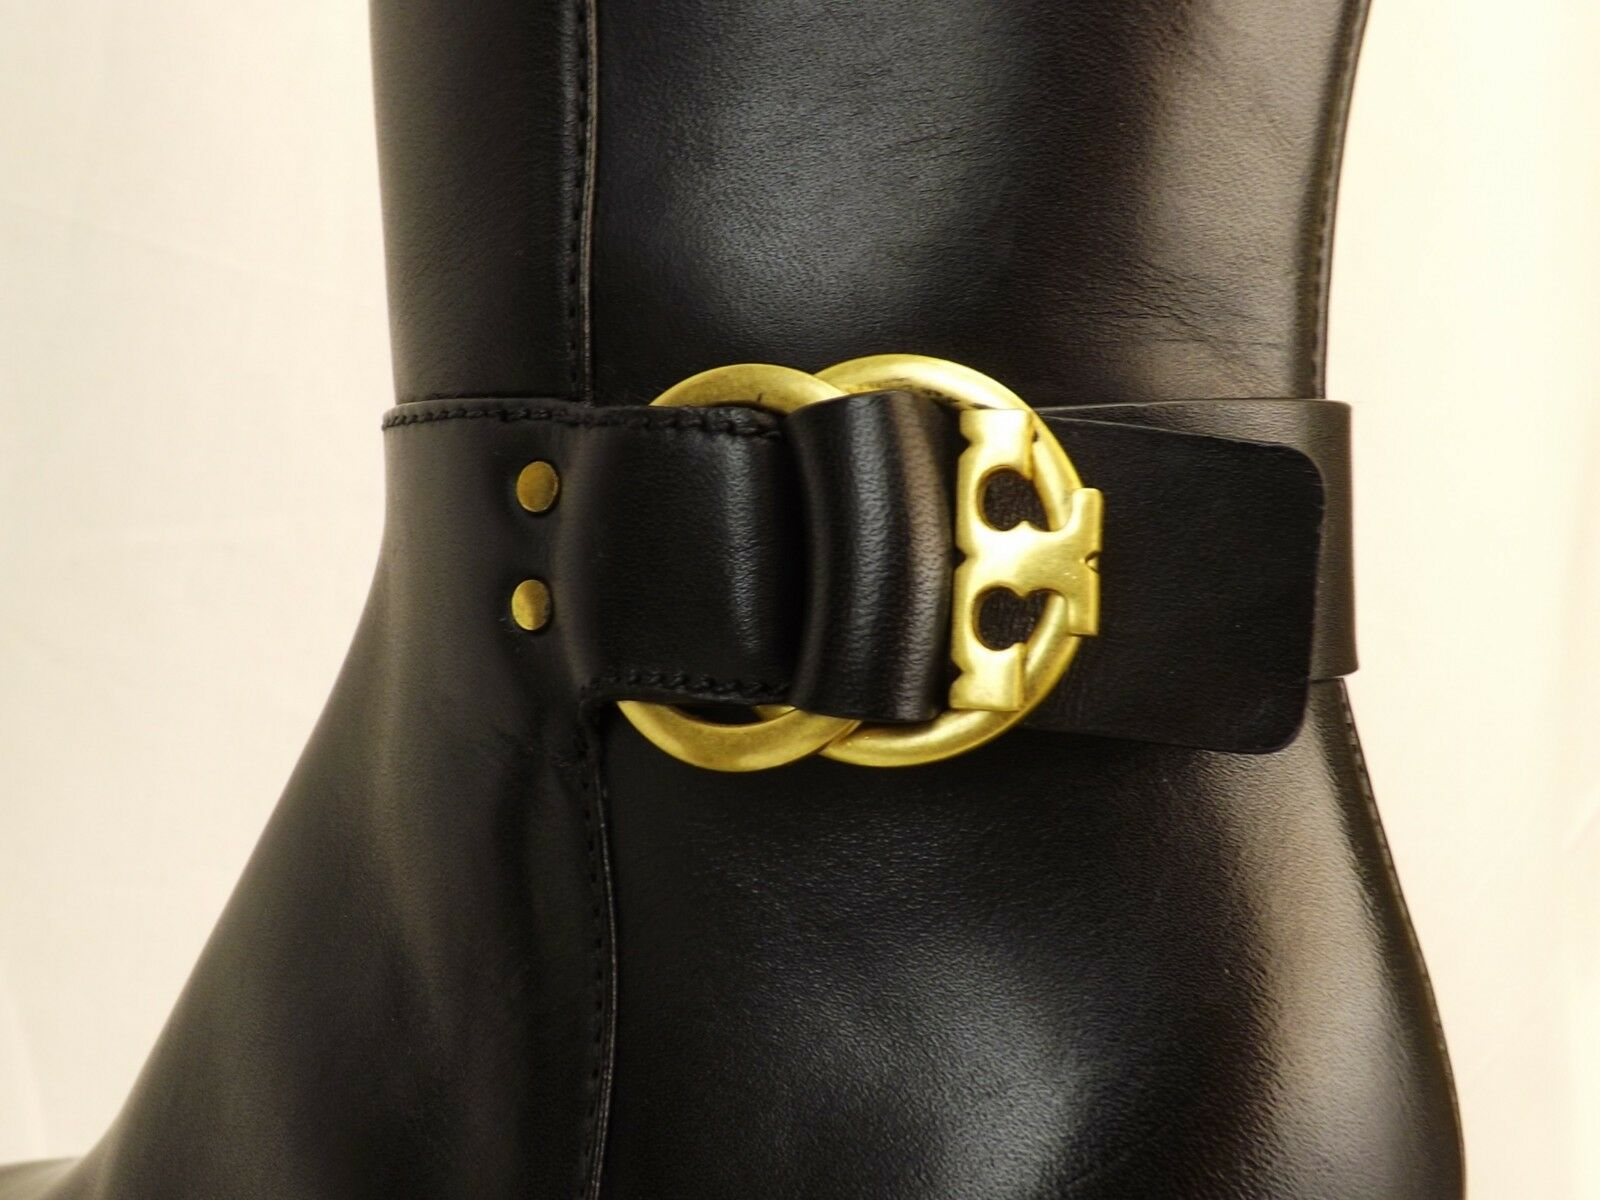 NIB TORY BURCH MARSDEN schwarz LEATHER REVA REVA REVA BUCKLE WIDE CALF RIDING ZIP Stiefel 10 6d1e85